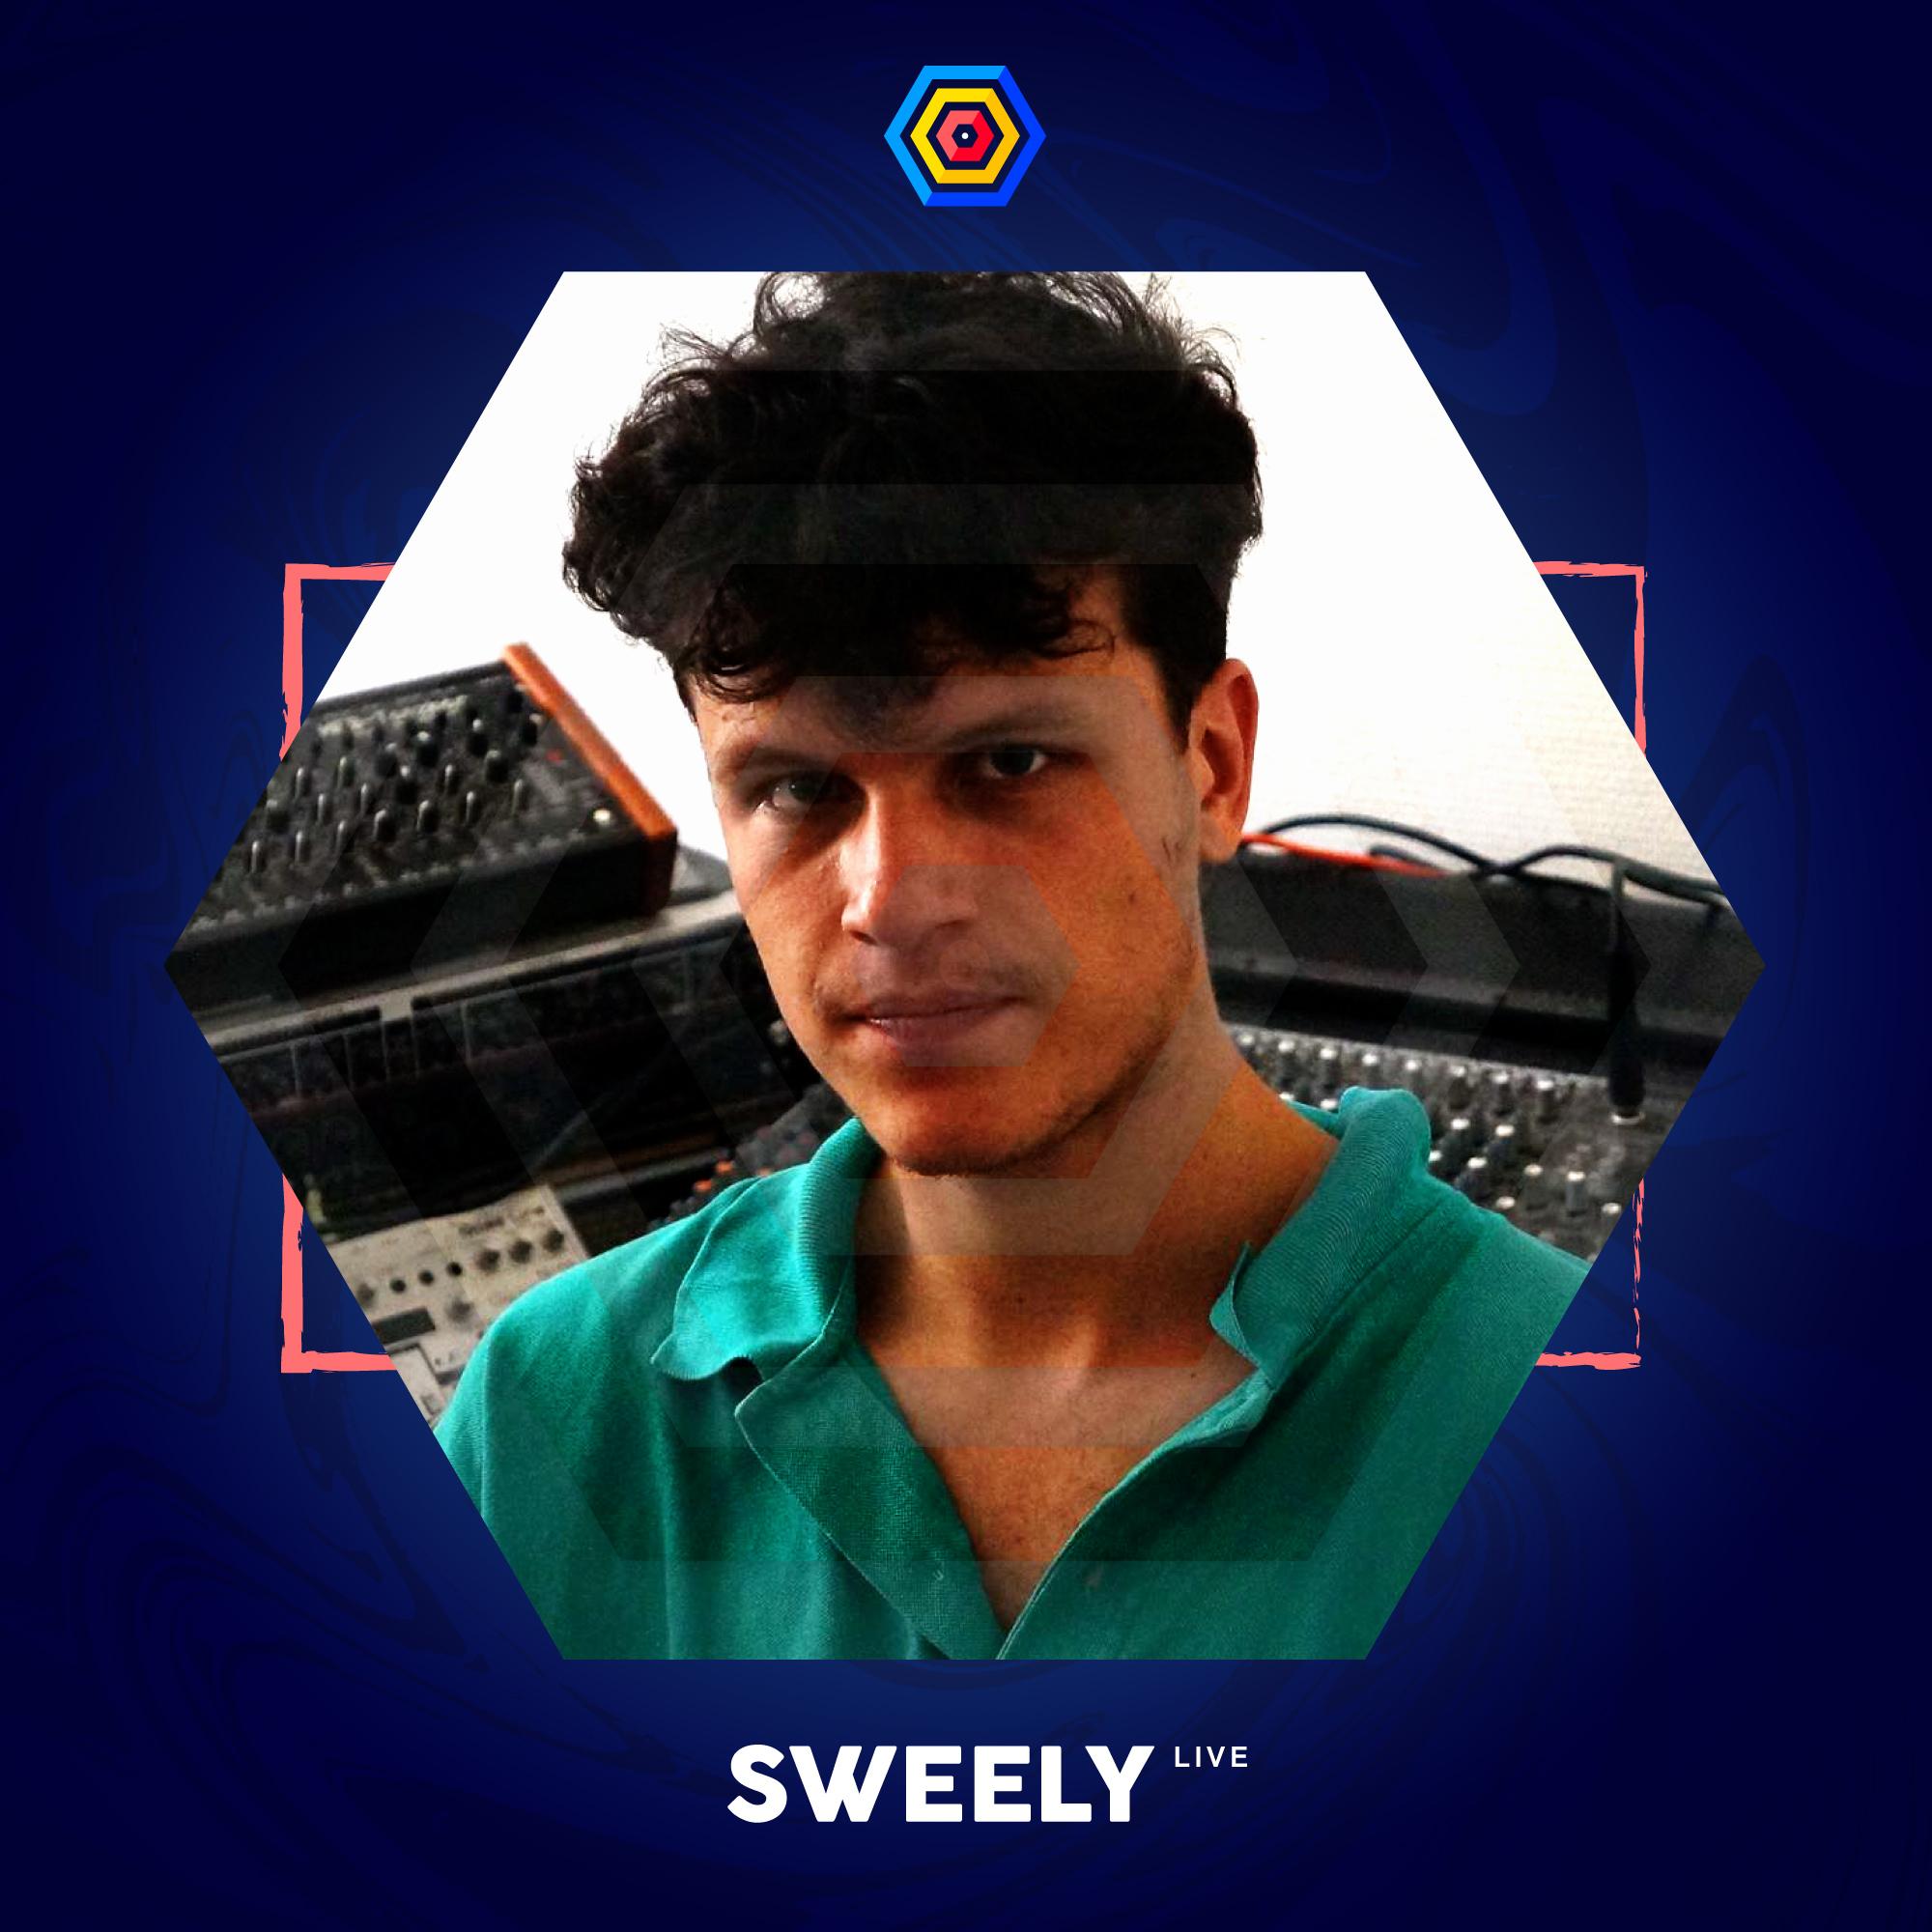 Sweely